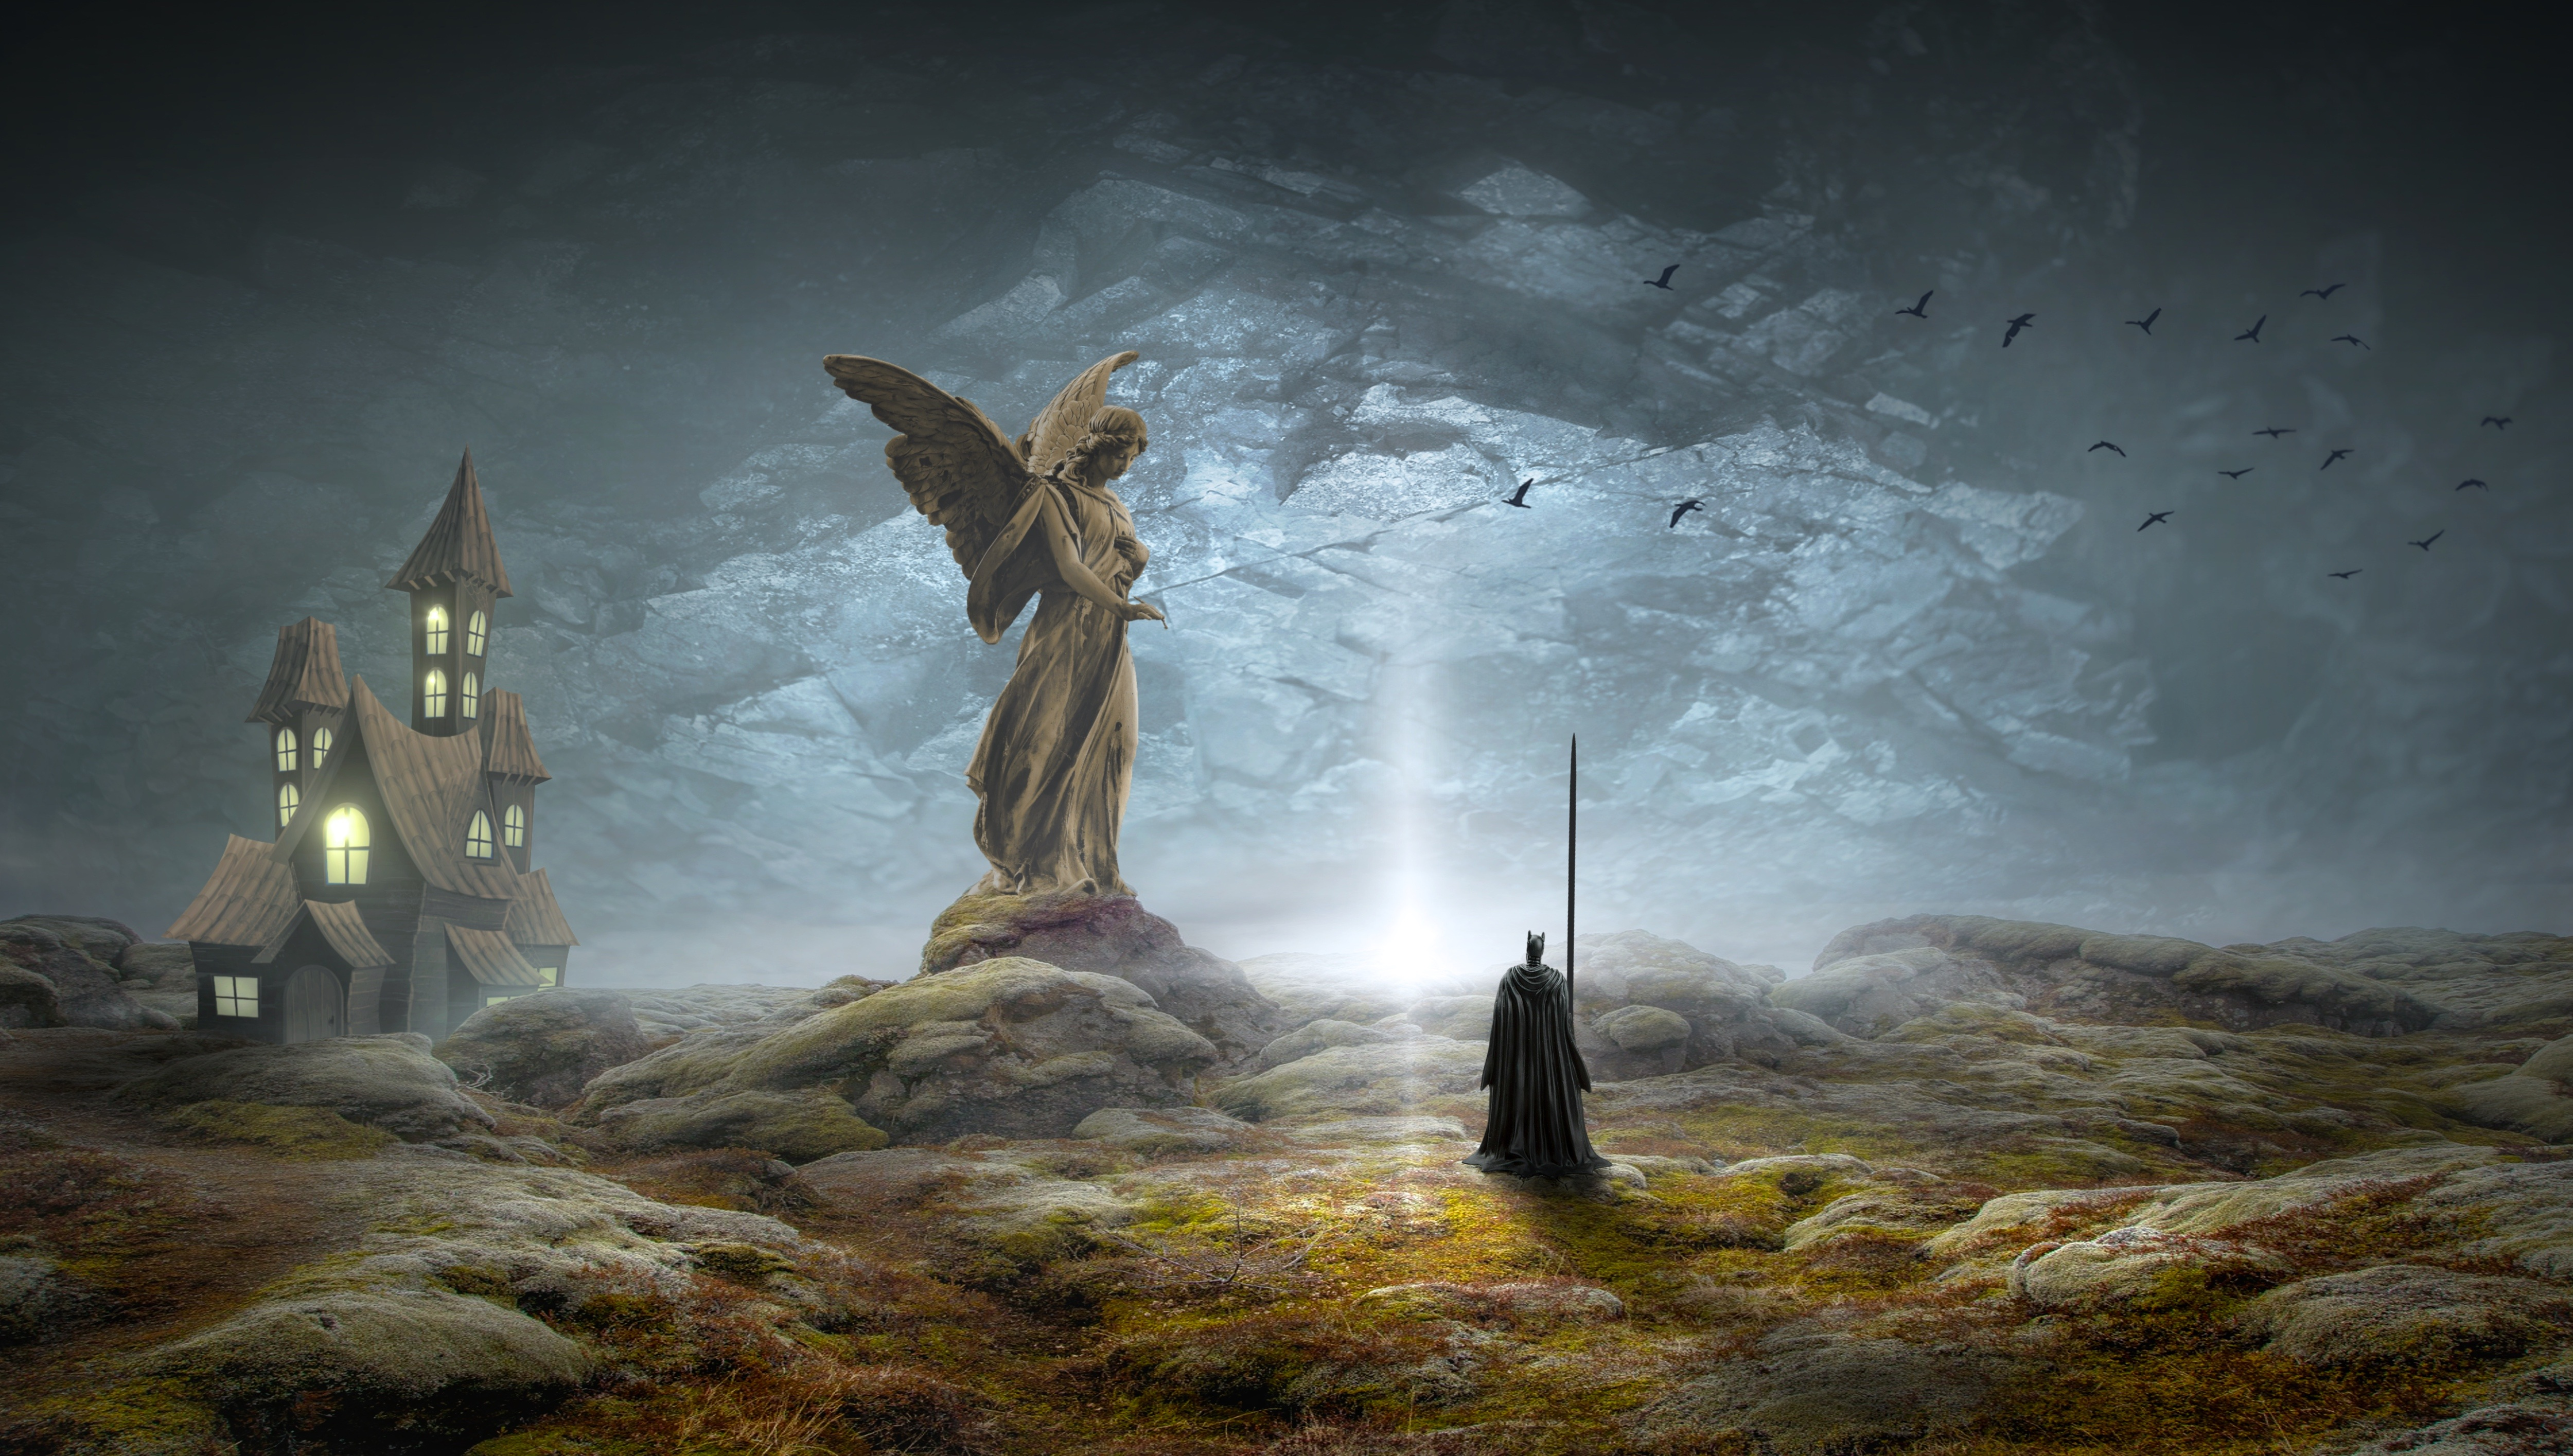 Fantasy mystical 5k hd artist 4k wallpapers images - Mystical background pictures ...